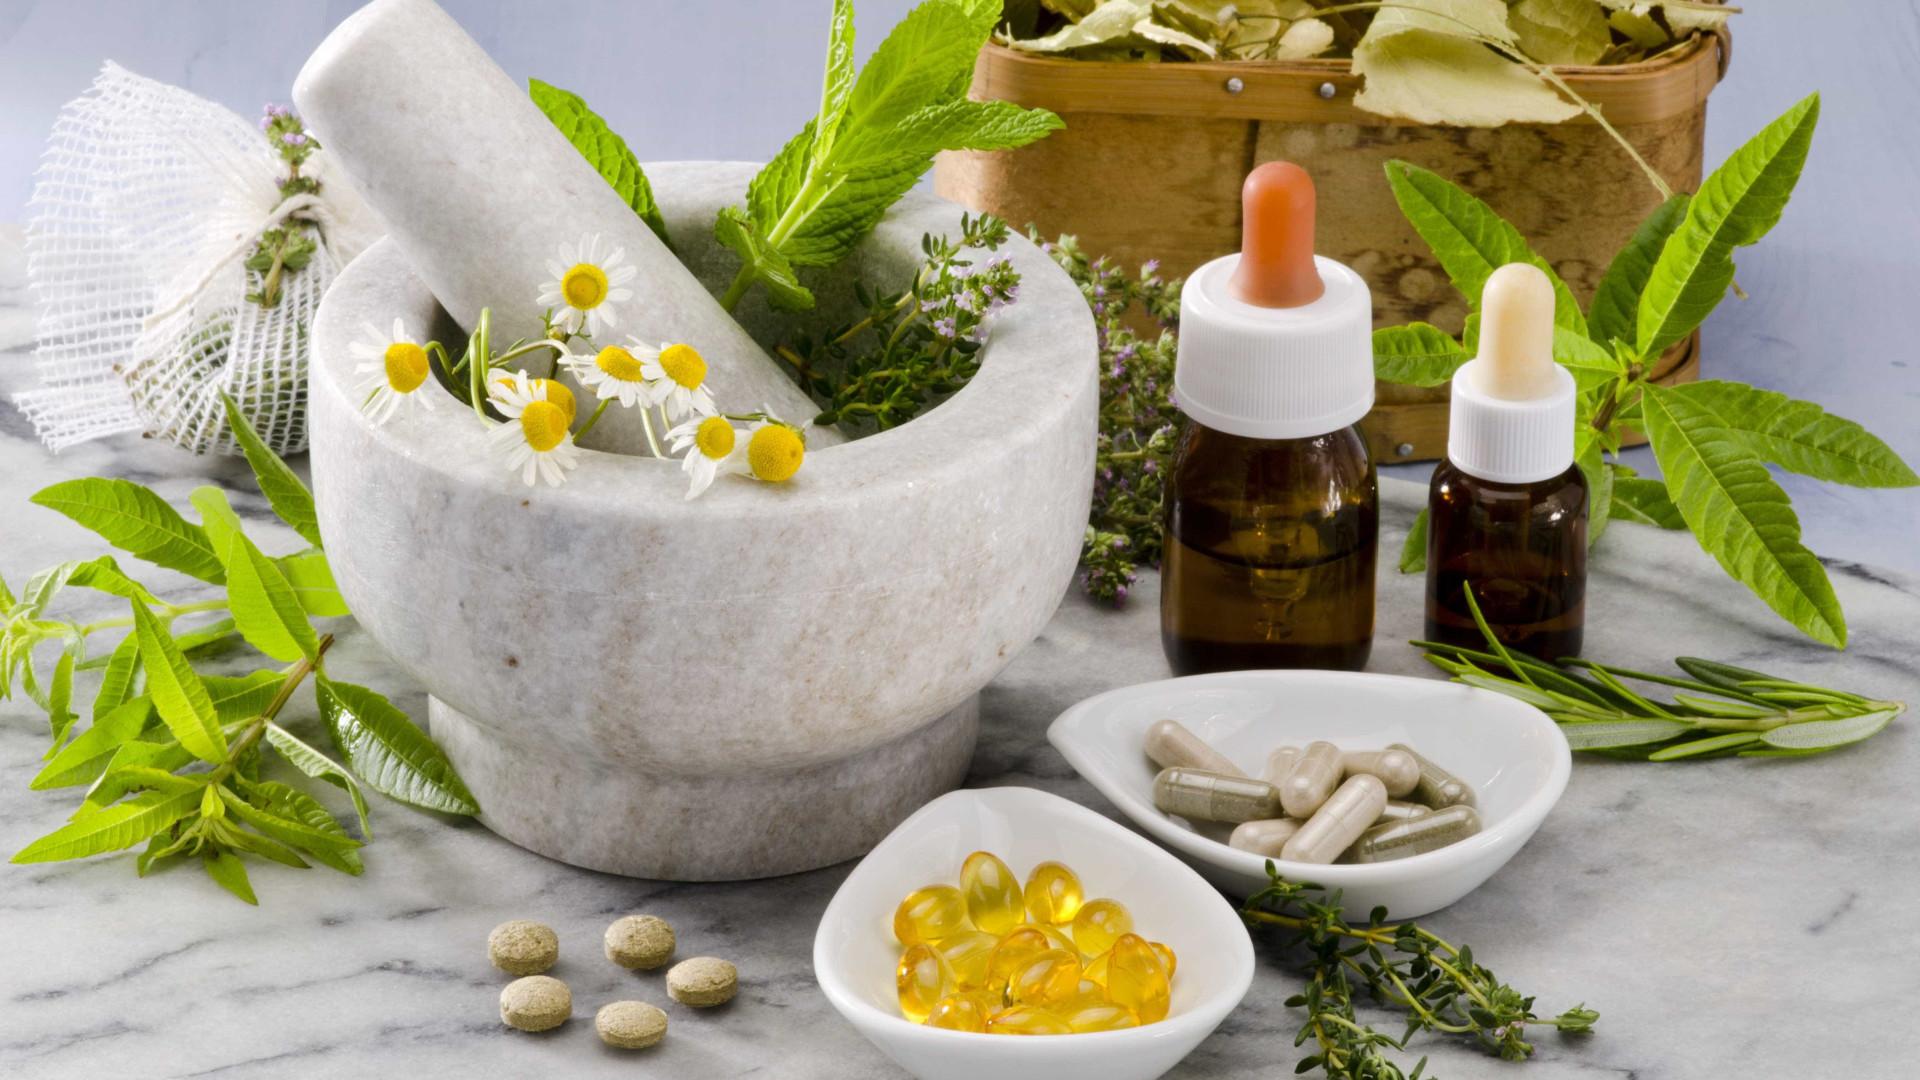 Anvisa publica novas diretrizes para homeopatia e suplementos; entenda